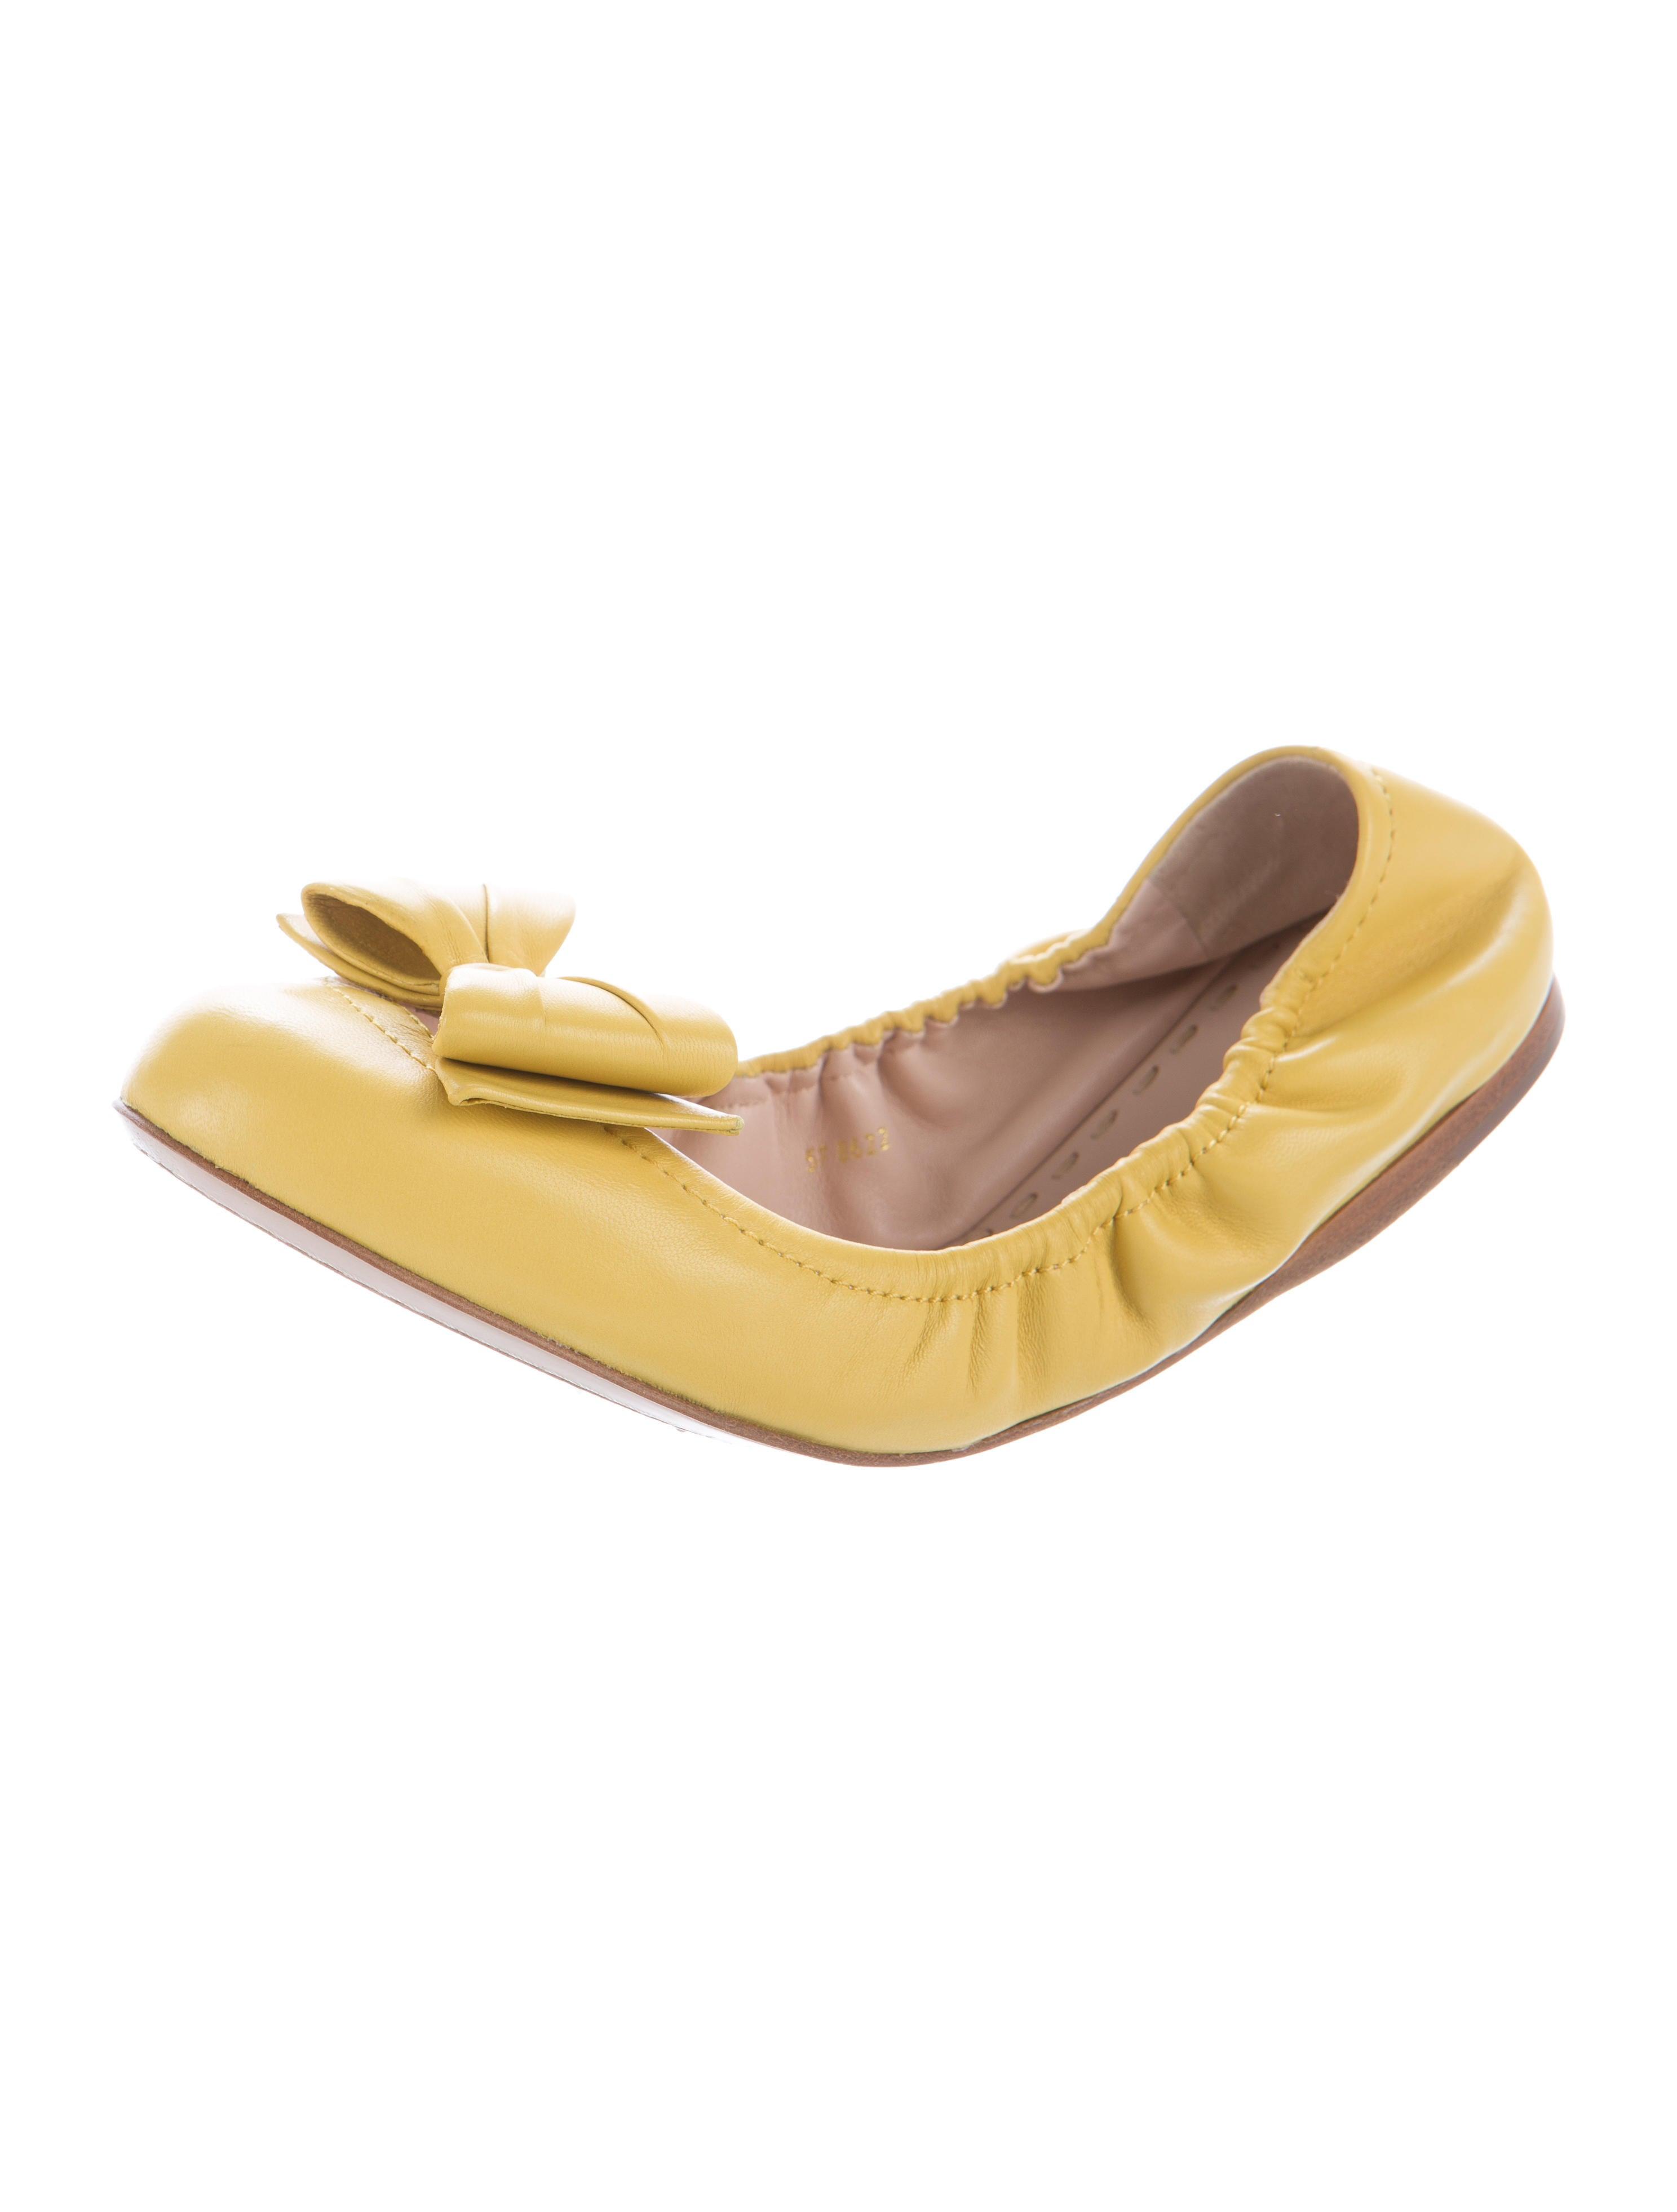 miu miu leather ballet flats shoes miu46744 the realreal